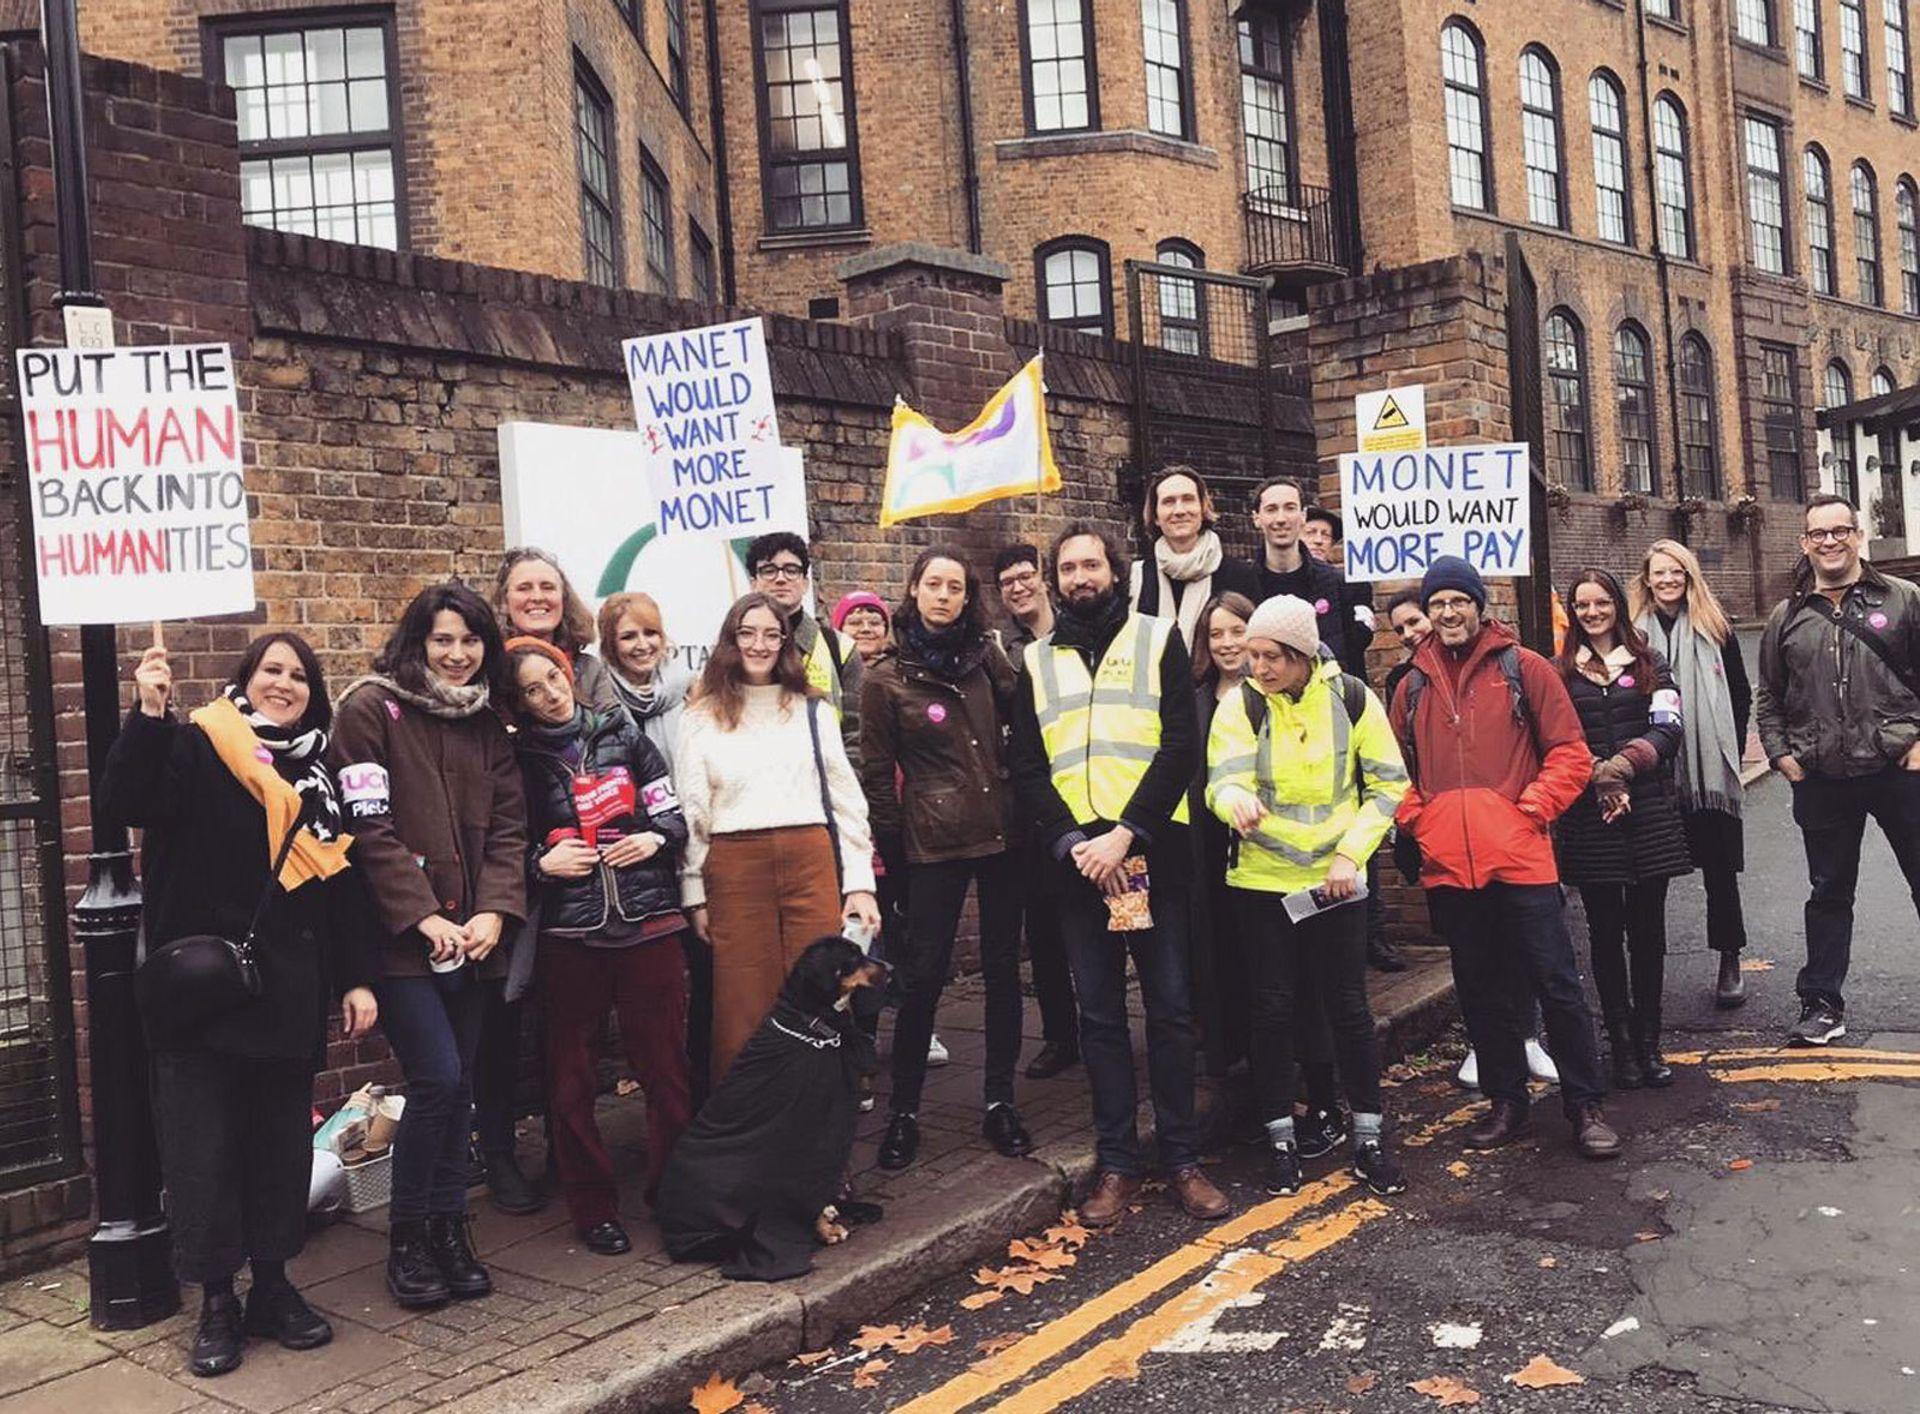 Courtauld Institute of Art staff on strike